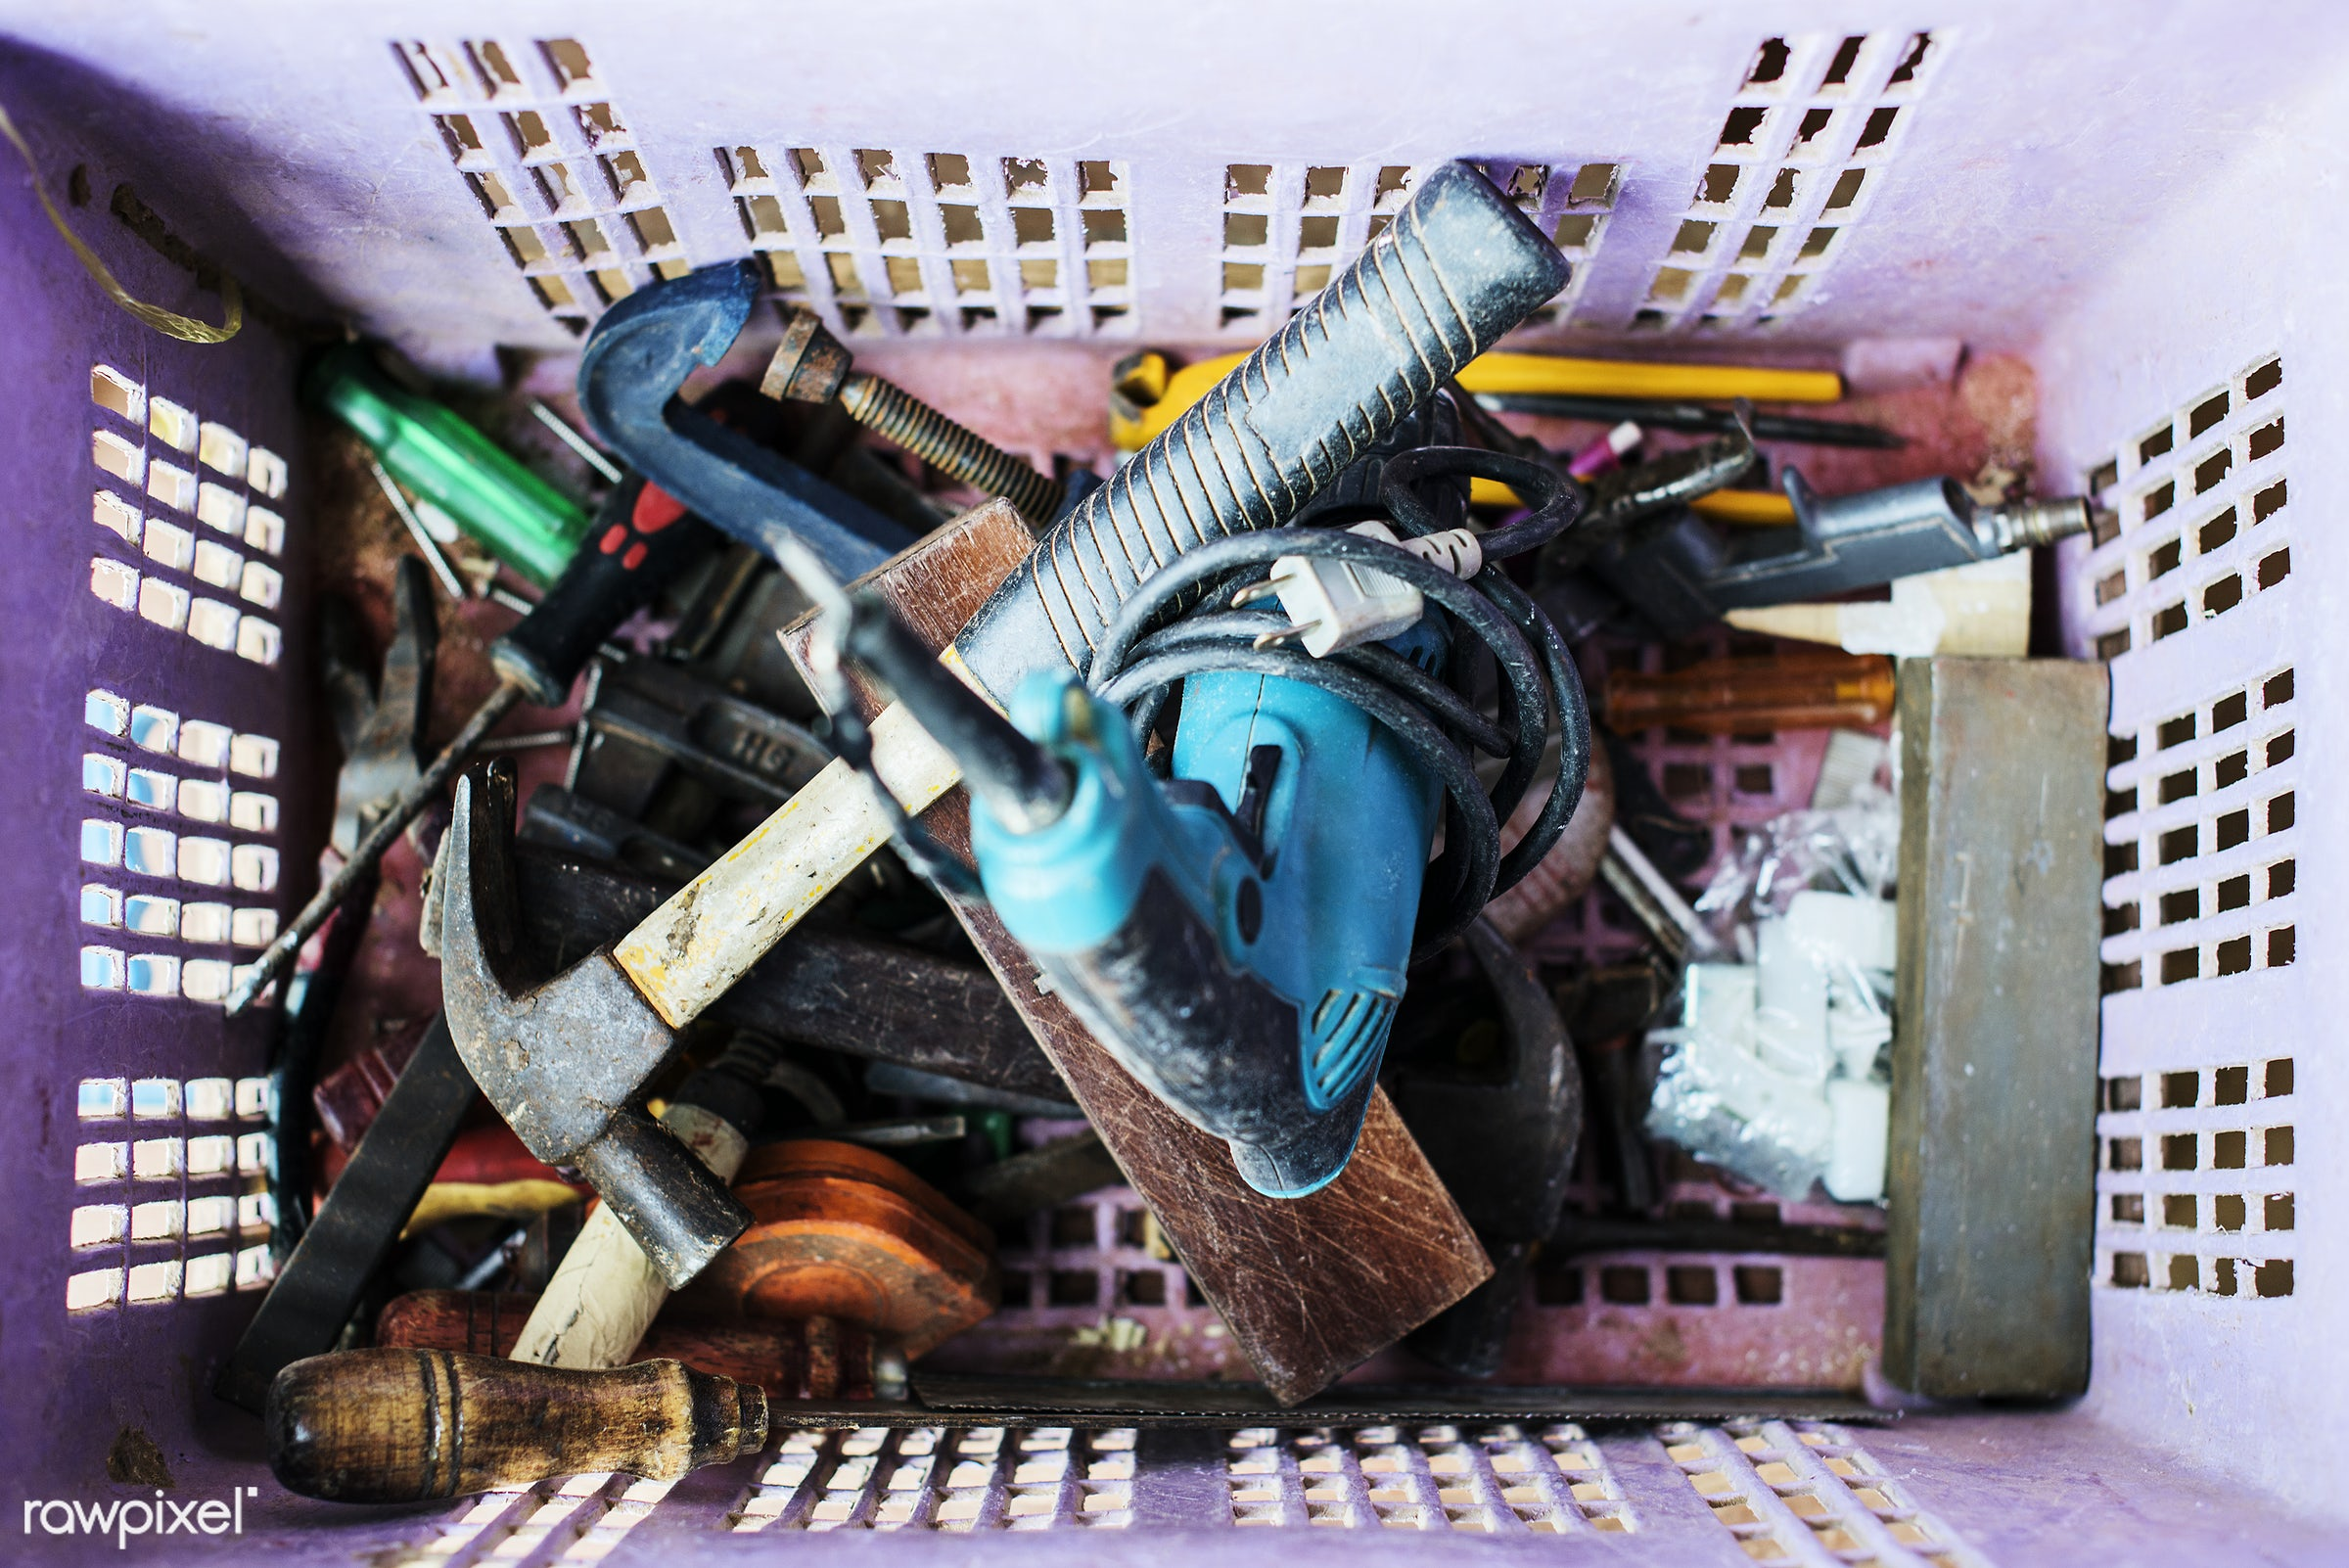 Construction tools - carpentry, construction, craftsman, carpenter, closeup, equipment, handyman, hardware, instrument,...